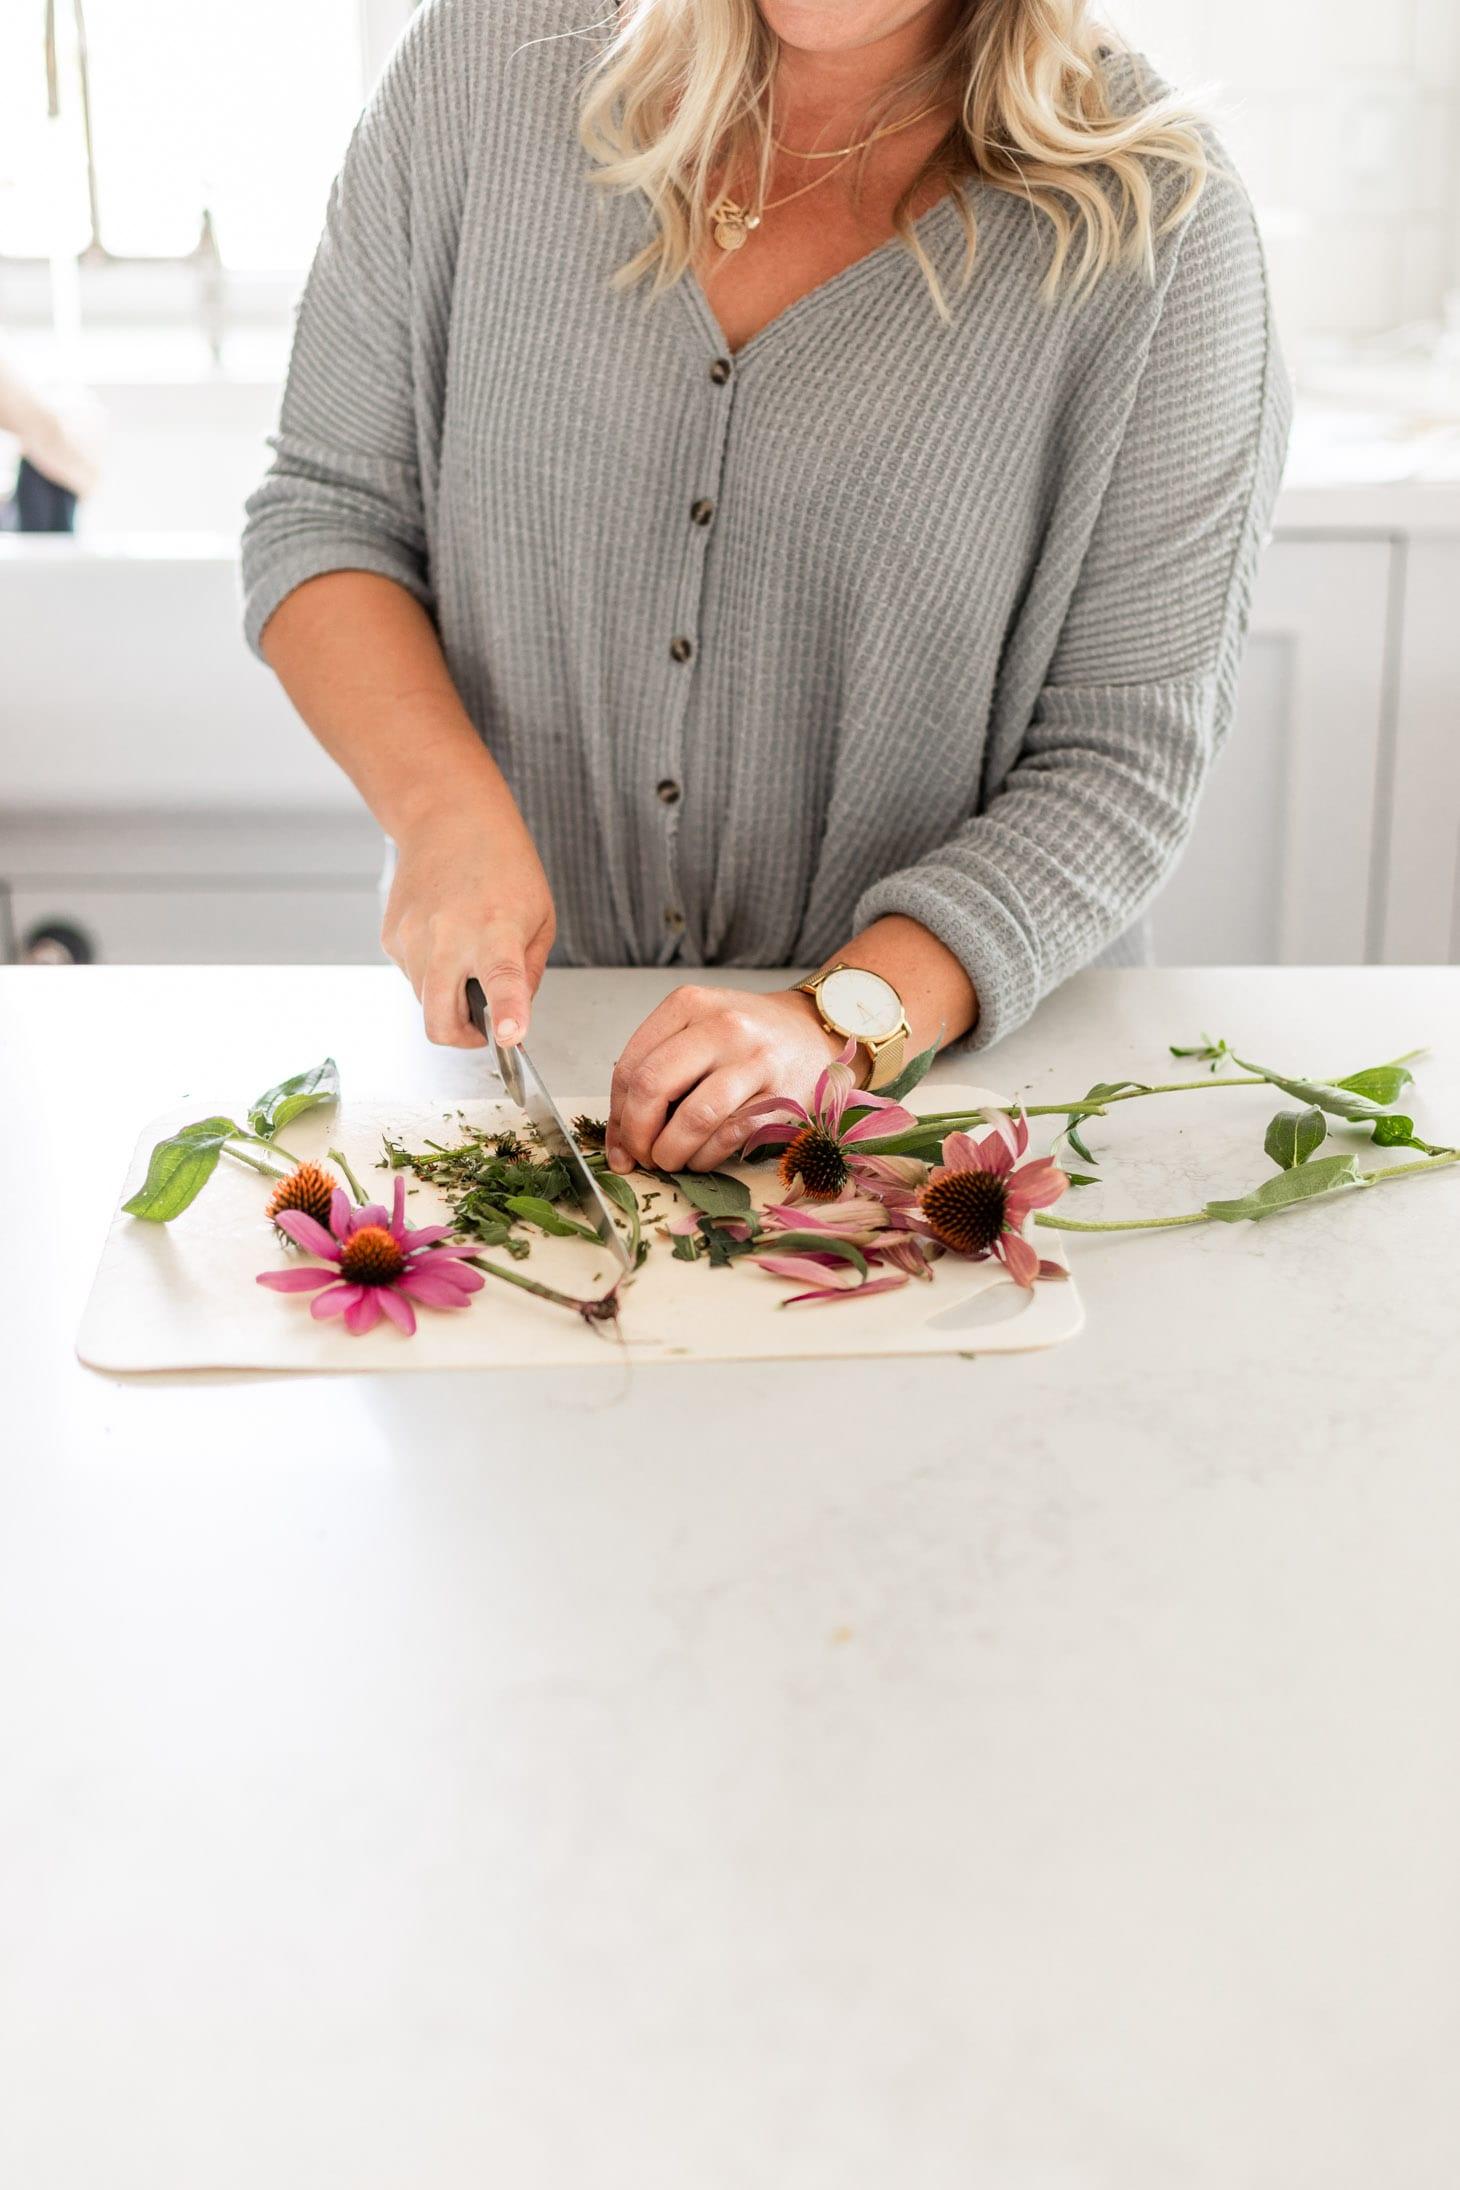 Jillian Harris My Homemade Echinacea Tincture